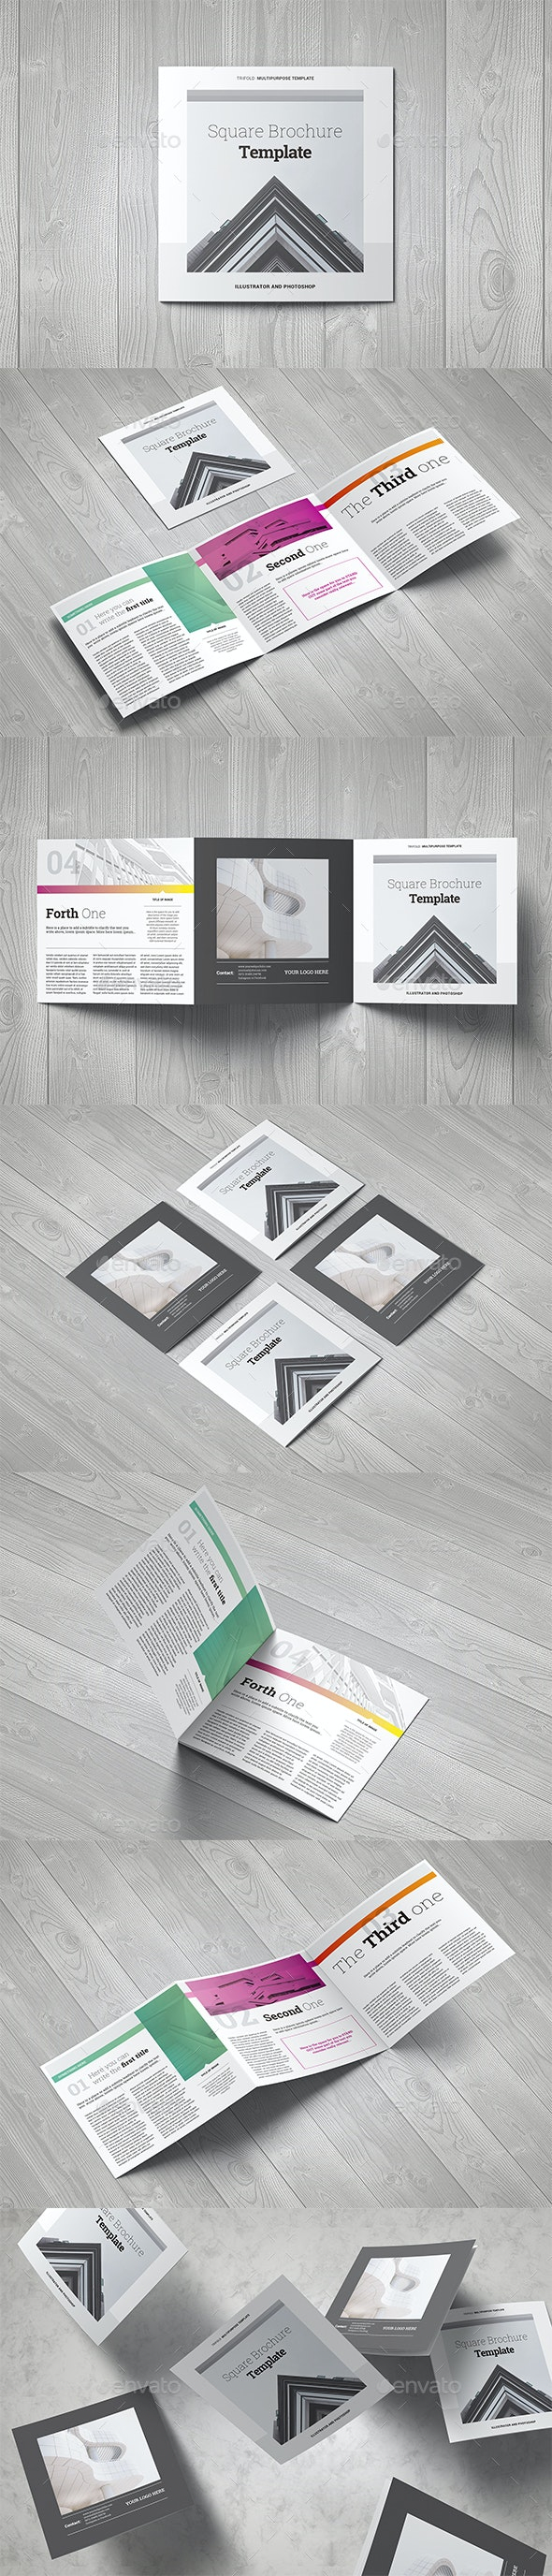 Square Trichure Template - Brochures Print Templates